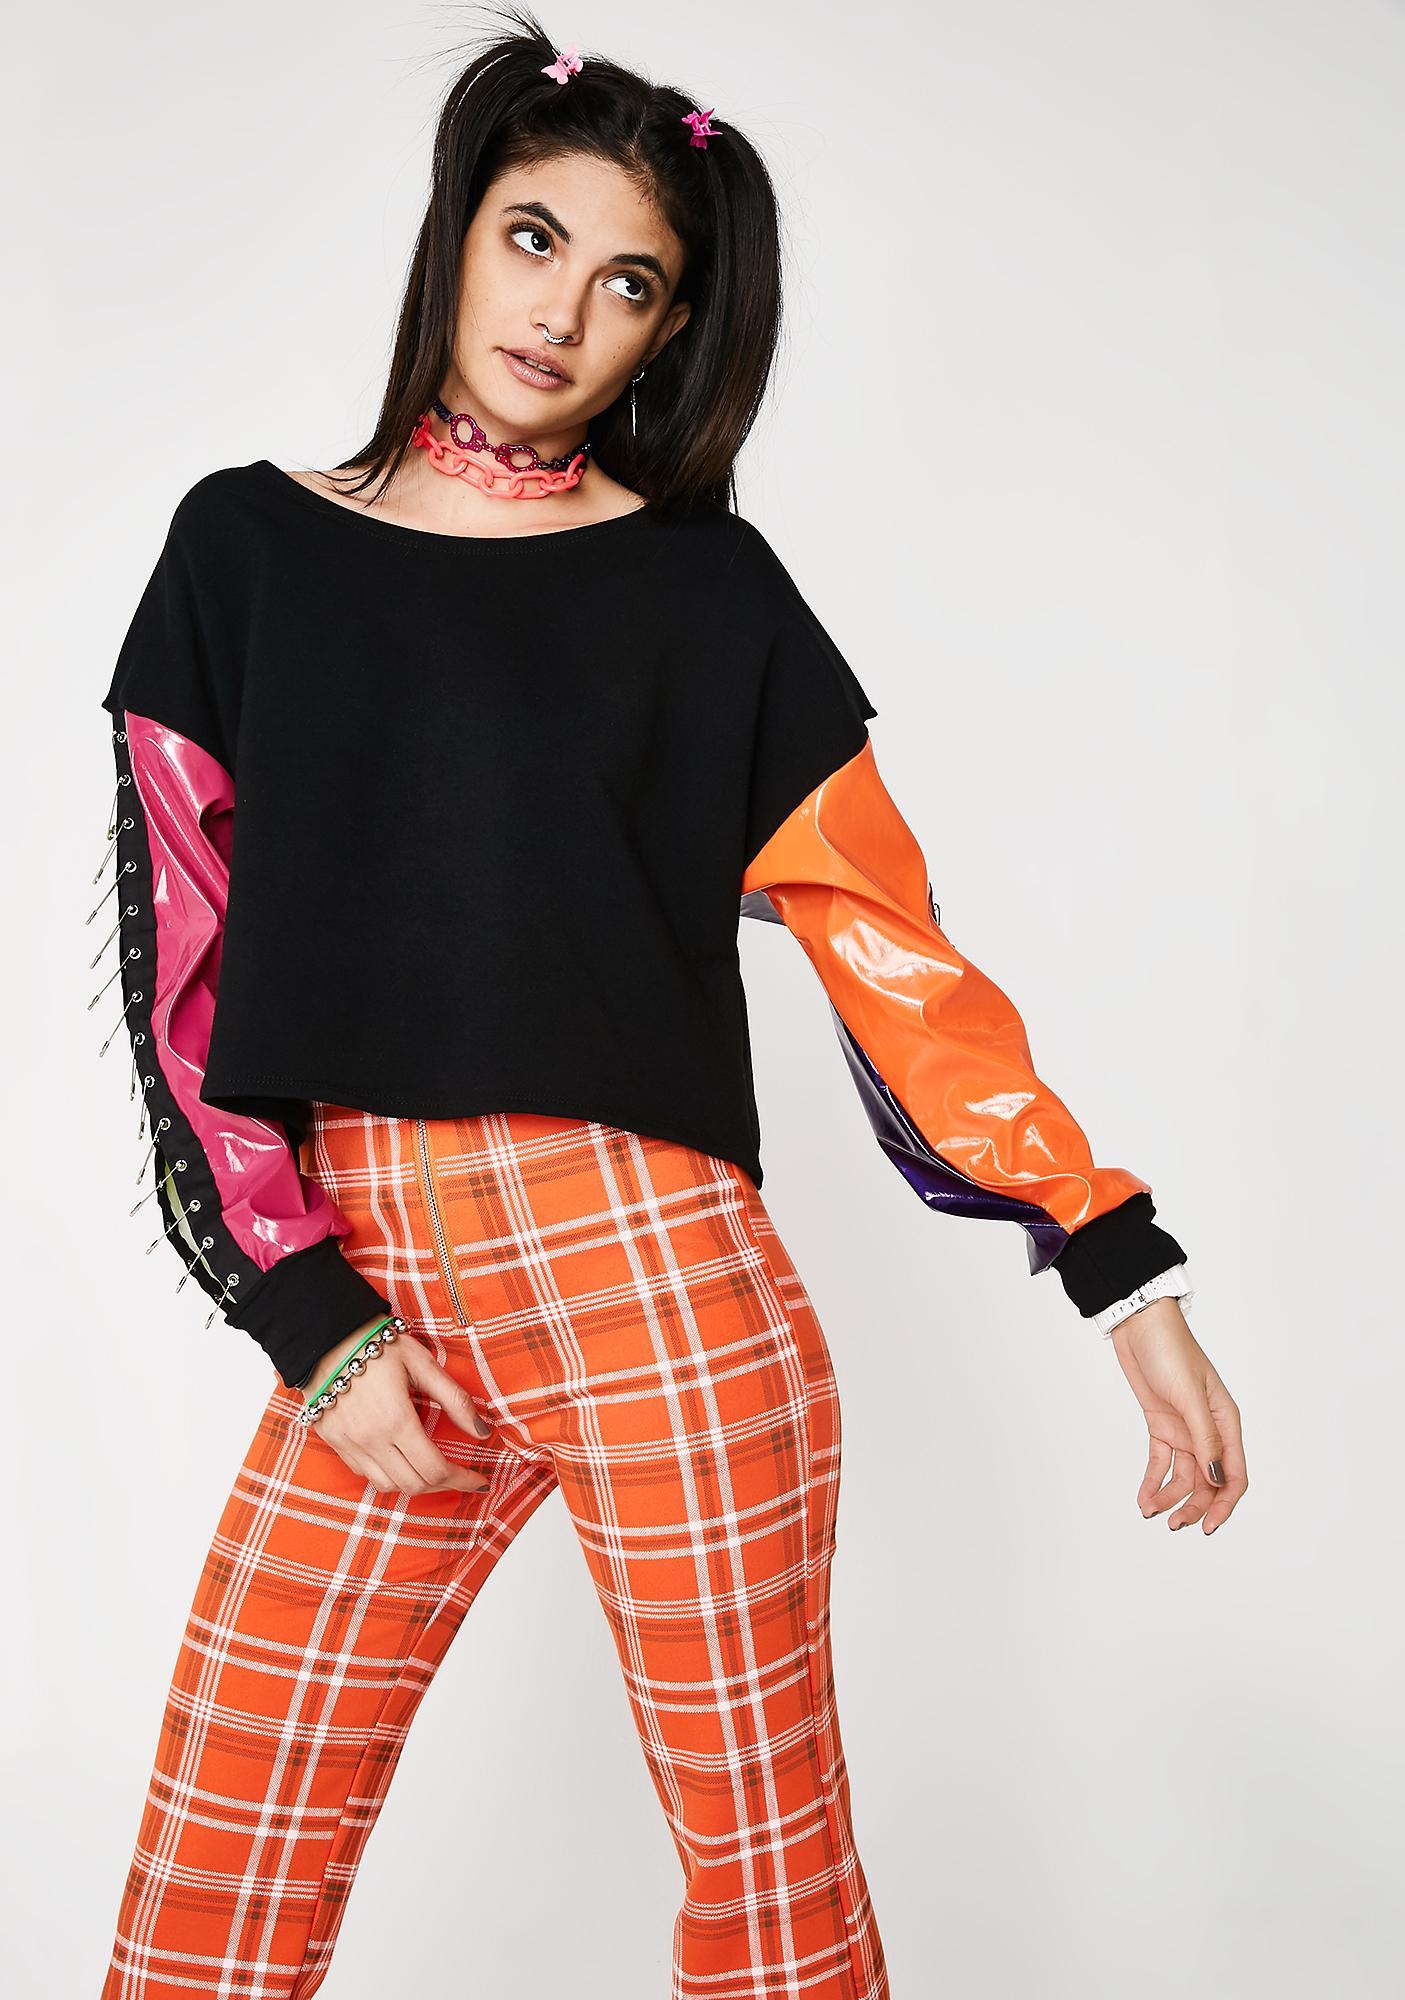 Indyanna Alerta Sweater